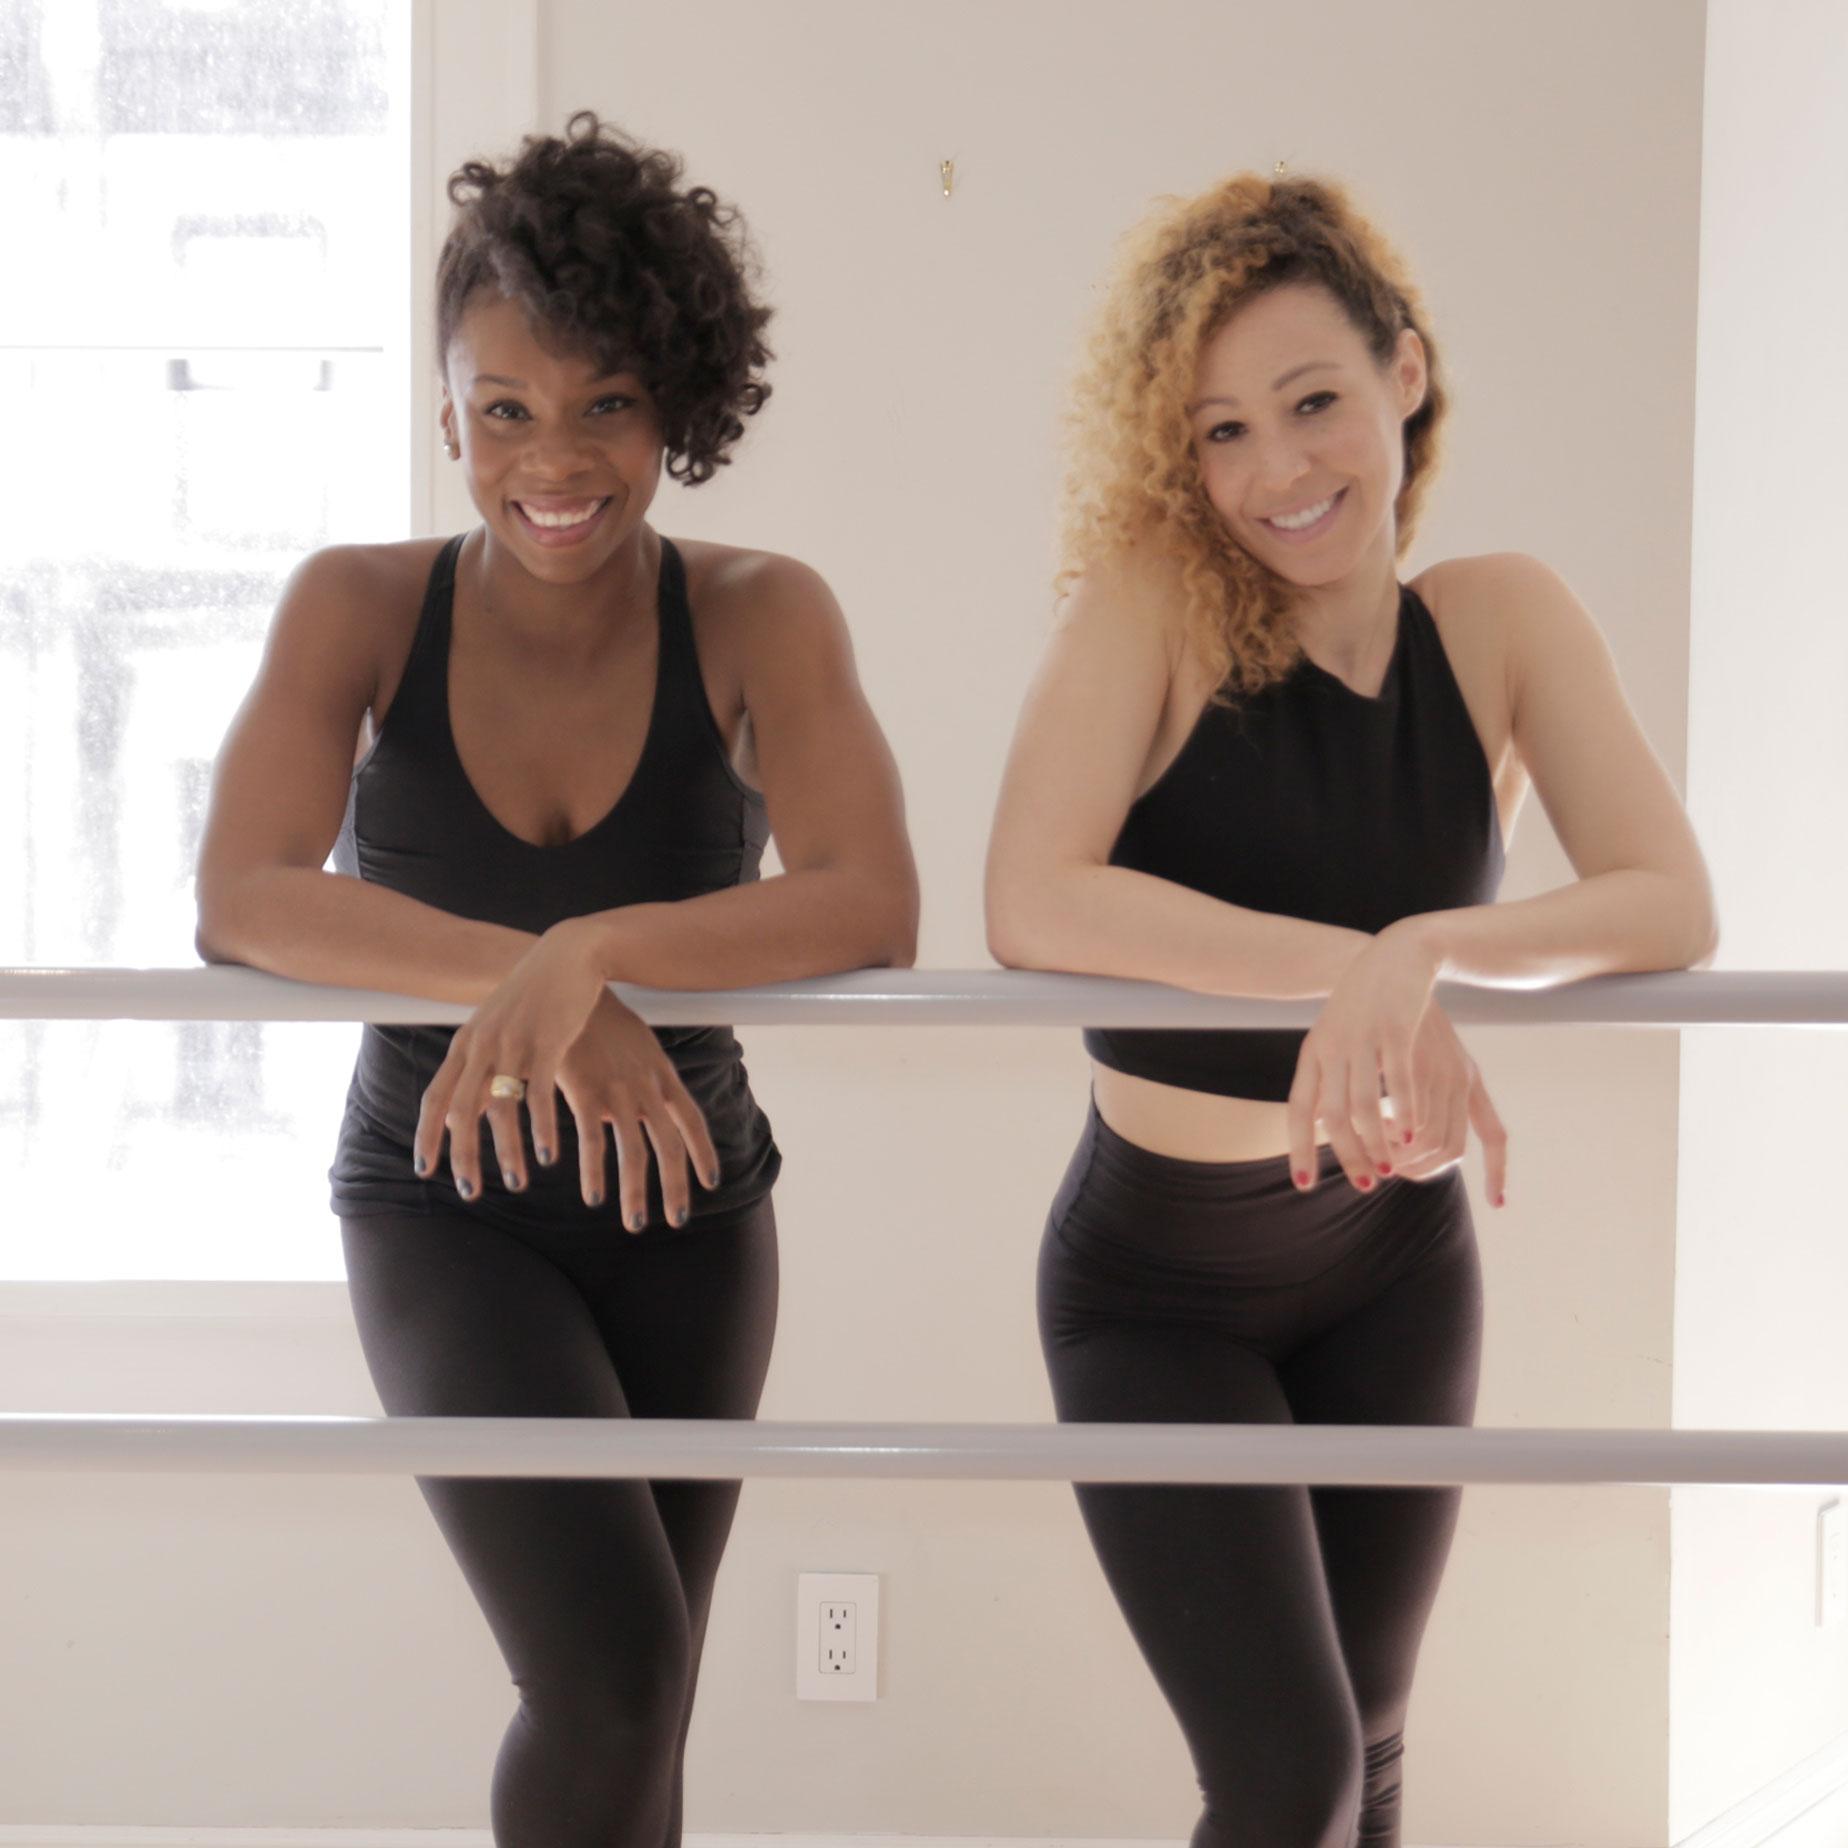 Little-Sprout-Fitness-NYC-Khori-Petinaud-Chelsey-Arce.jpg